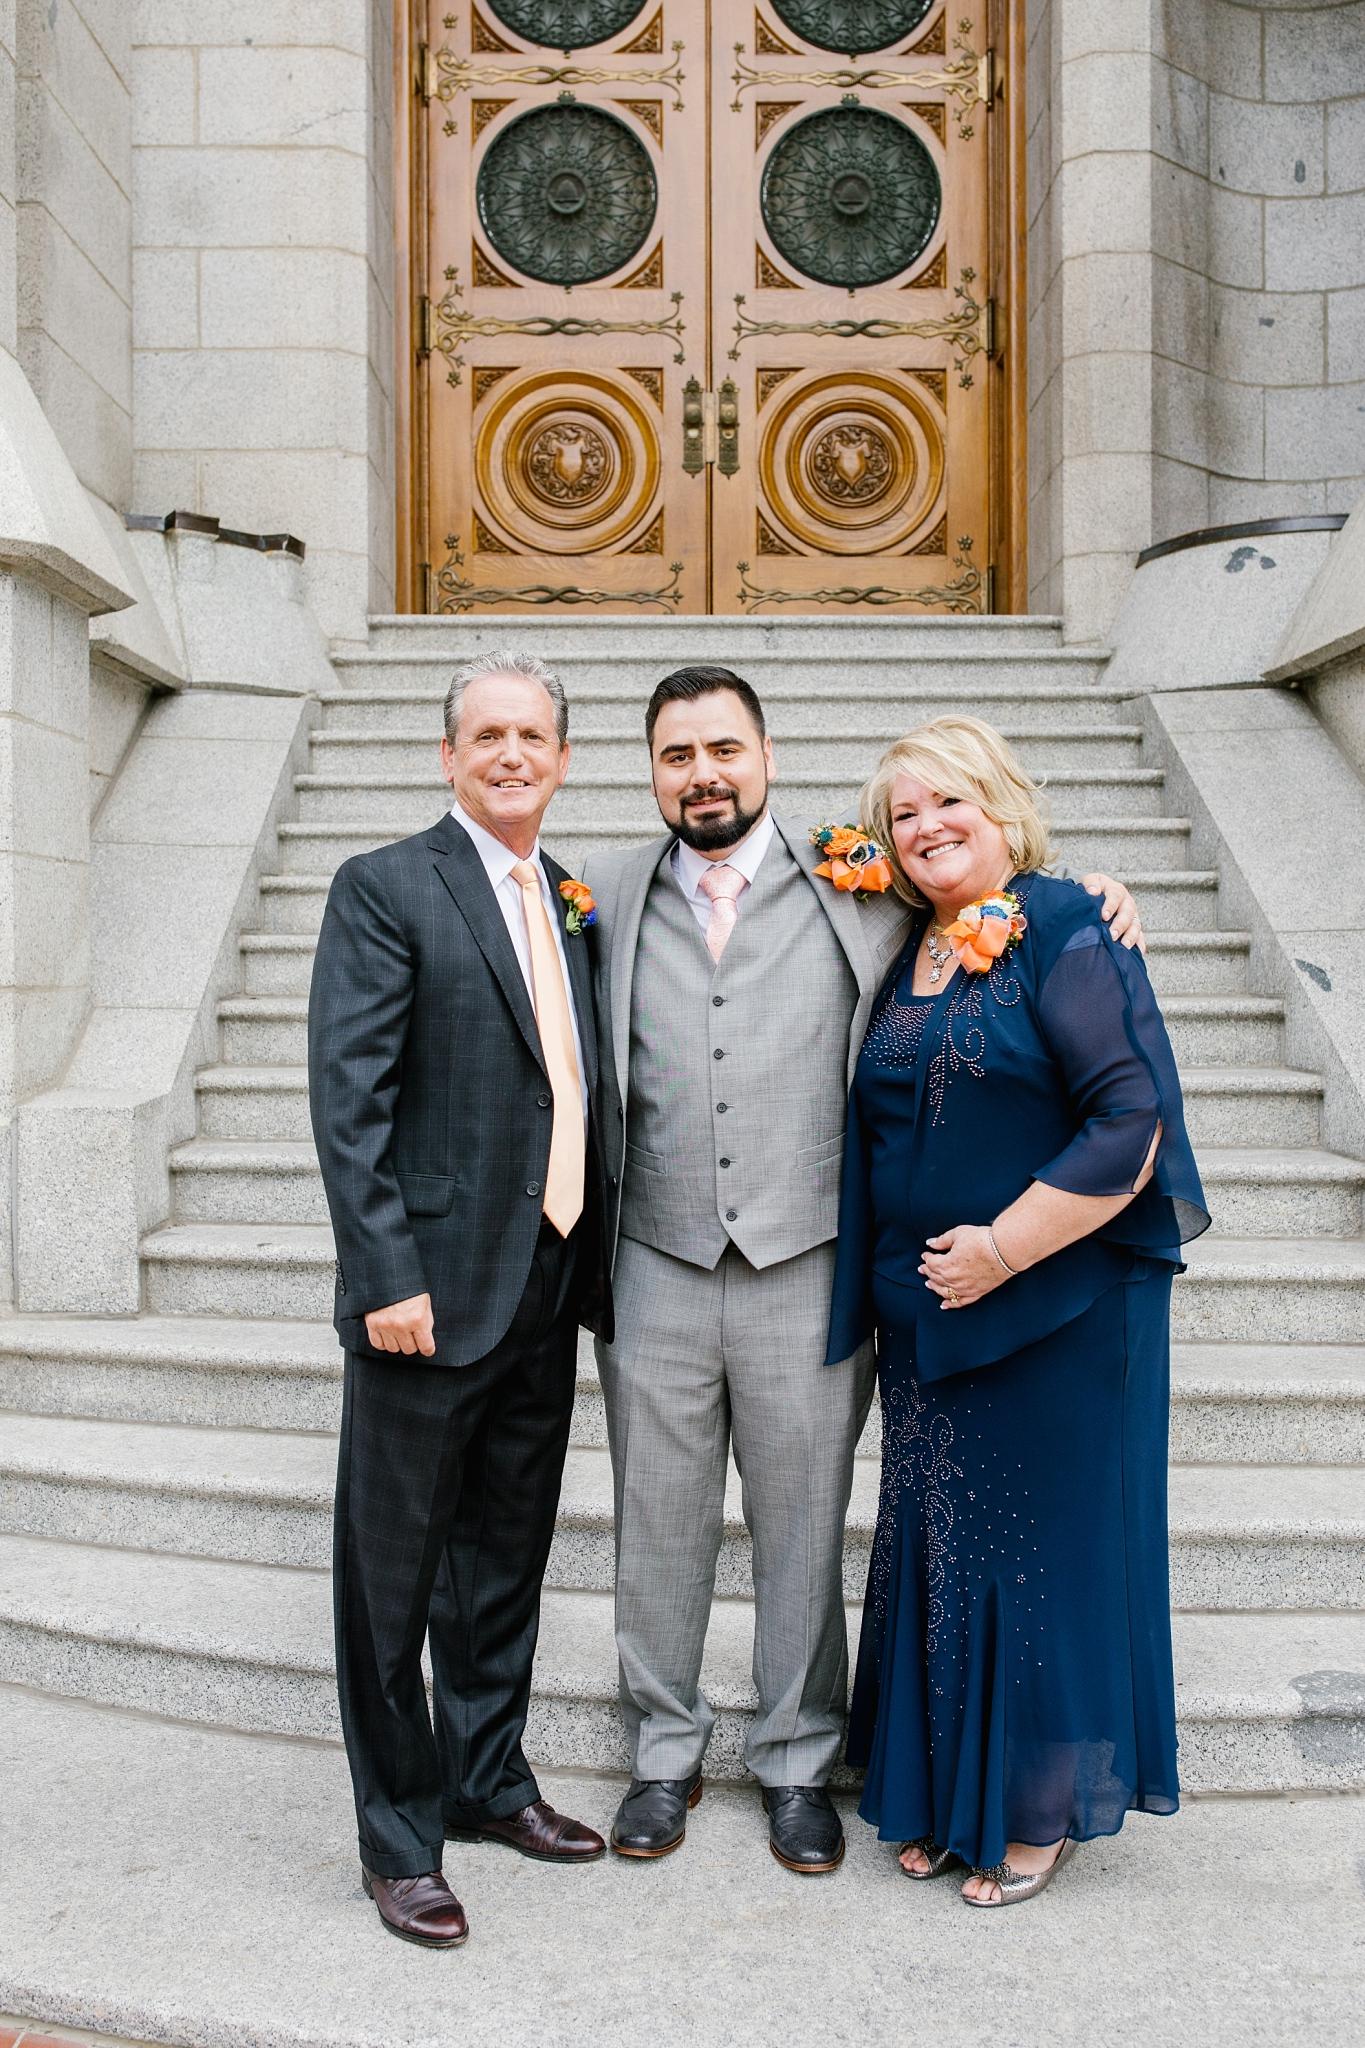 Justin and Melissa-67_Lizzie-B-Imagery-Utah-Wedding-Photographer-Salt-Lake-City-Temple-Photographer-Lion-House-Luncheon-The-Grand-Ballroom-Bountiful.jpg